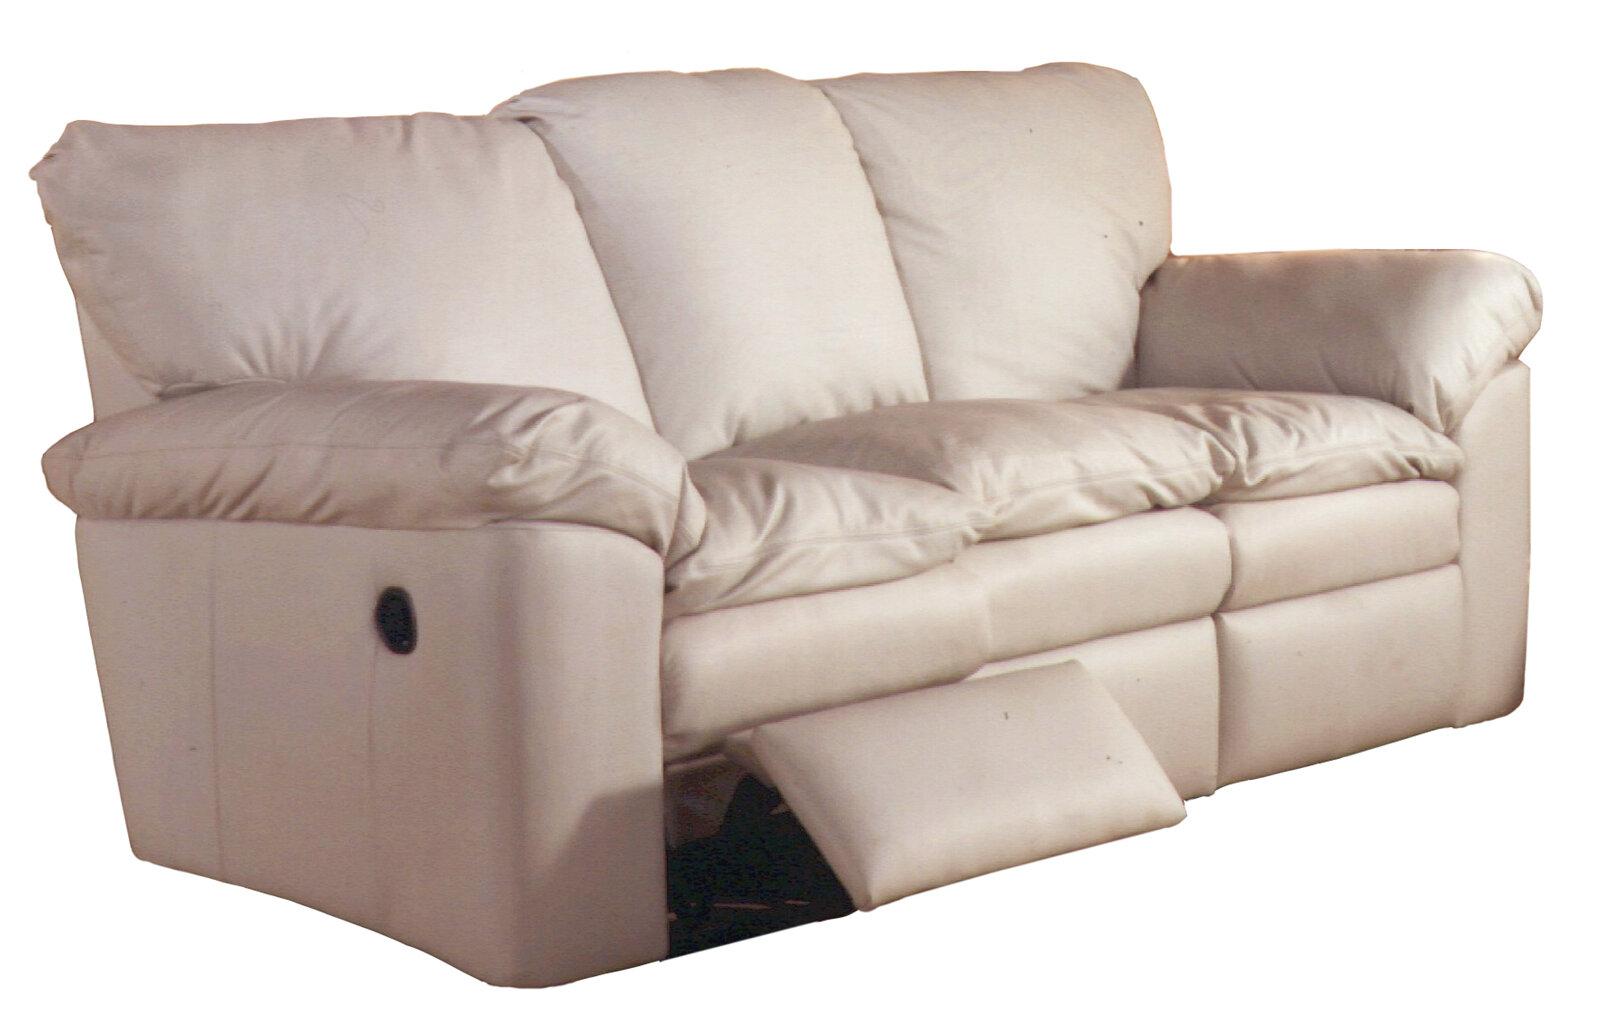 Enjoyable Omnia Leather El Dorado Reclining Sofa Reviews Wayfair Cjindustries Chair Design For Home Cjindustriesco